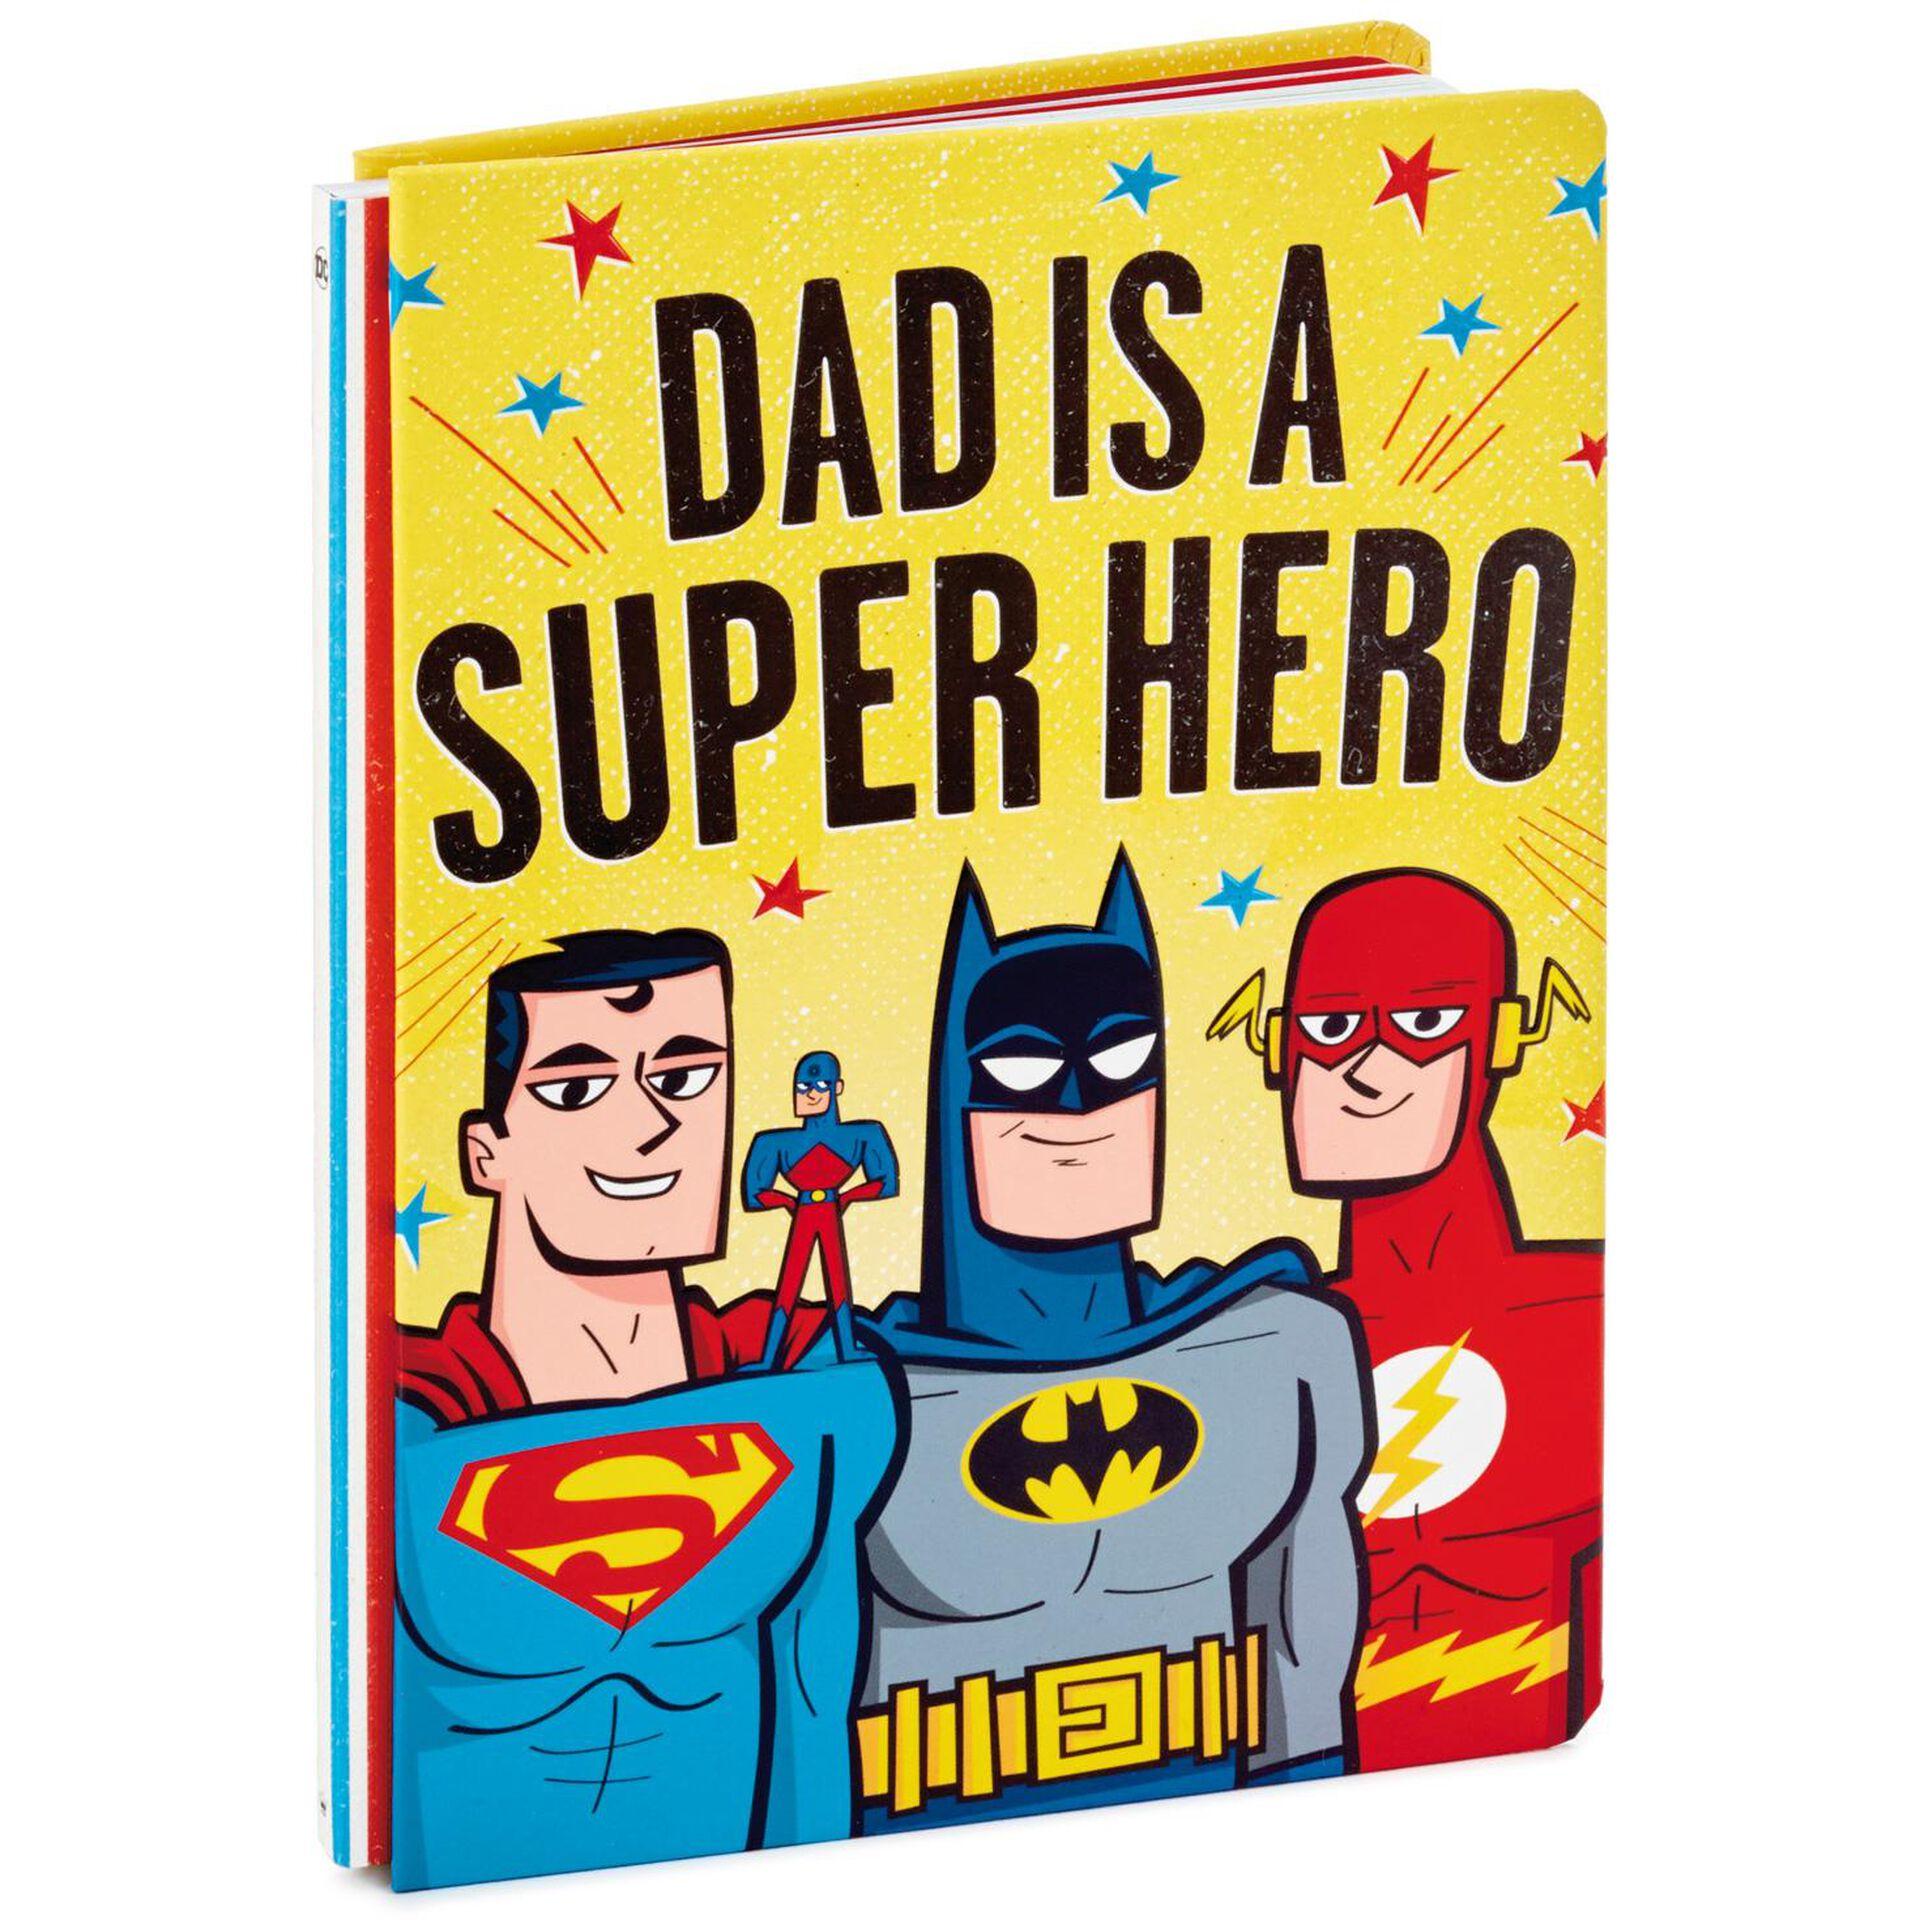 Dad Is a Super Hero Book